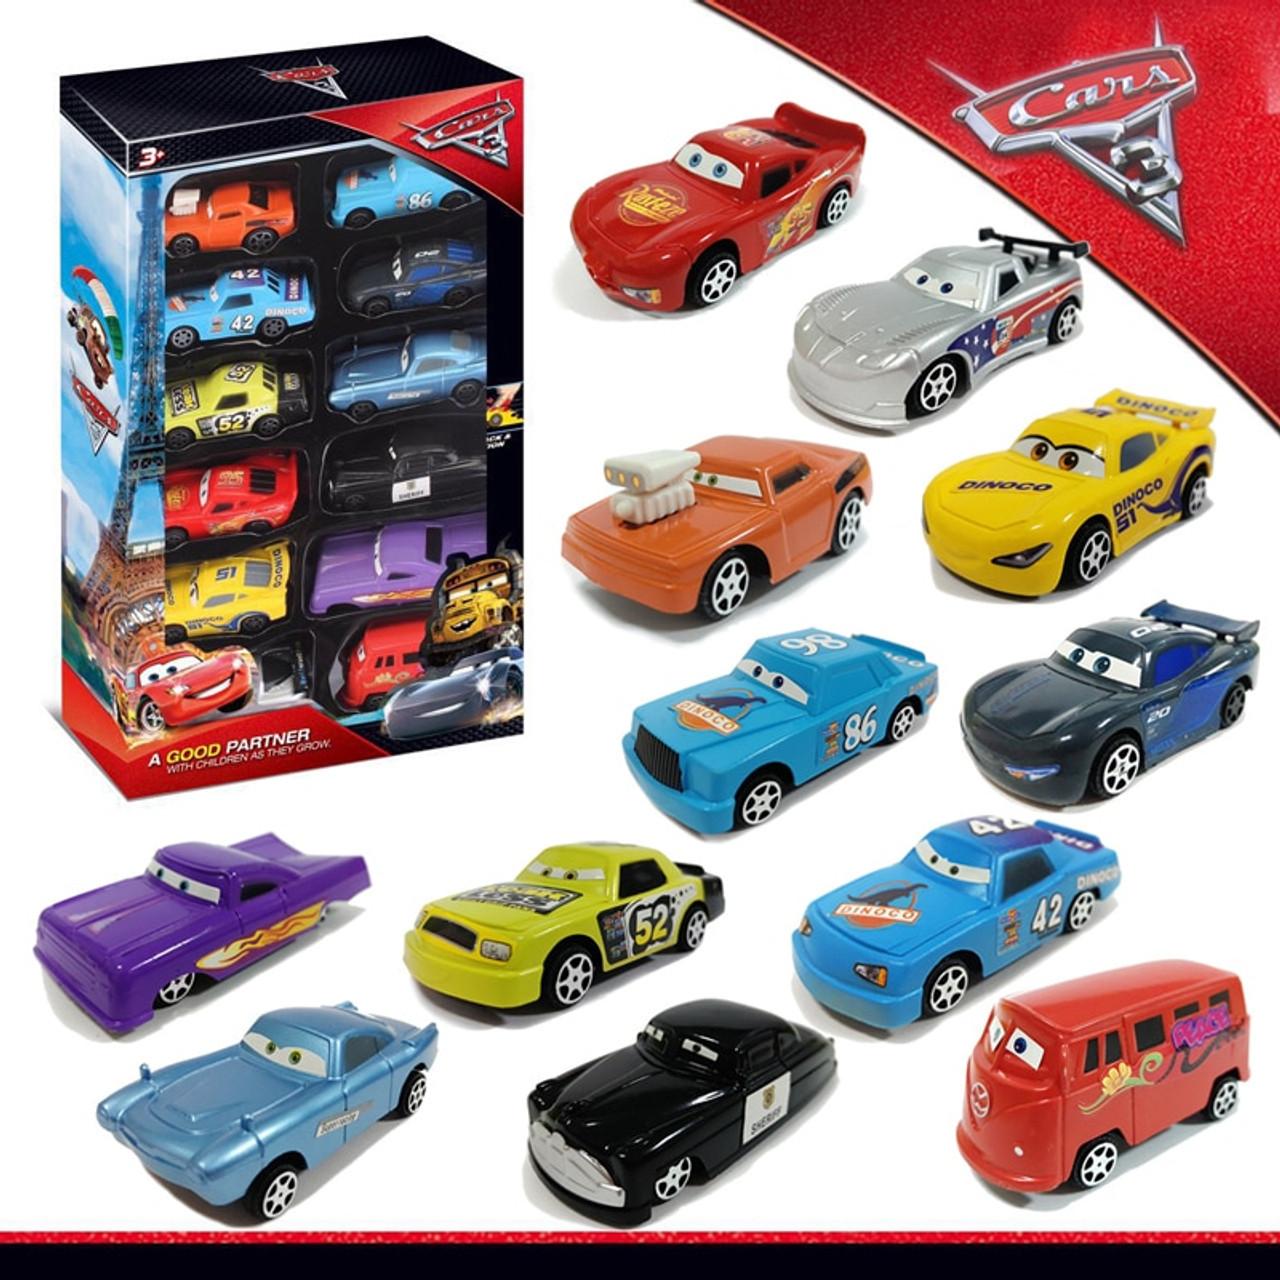 12 Piece Plastic Disney Pixar Cars 3 Model Car Toys Gift Box Set